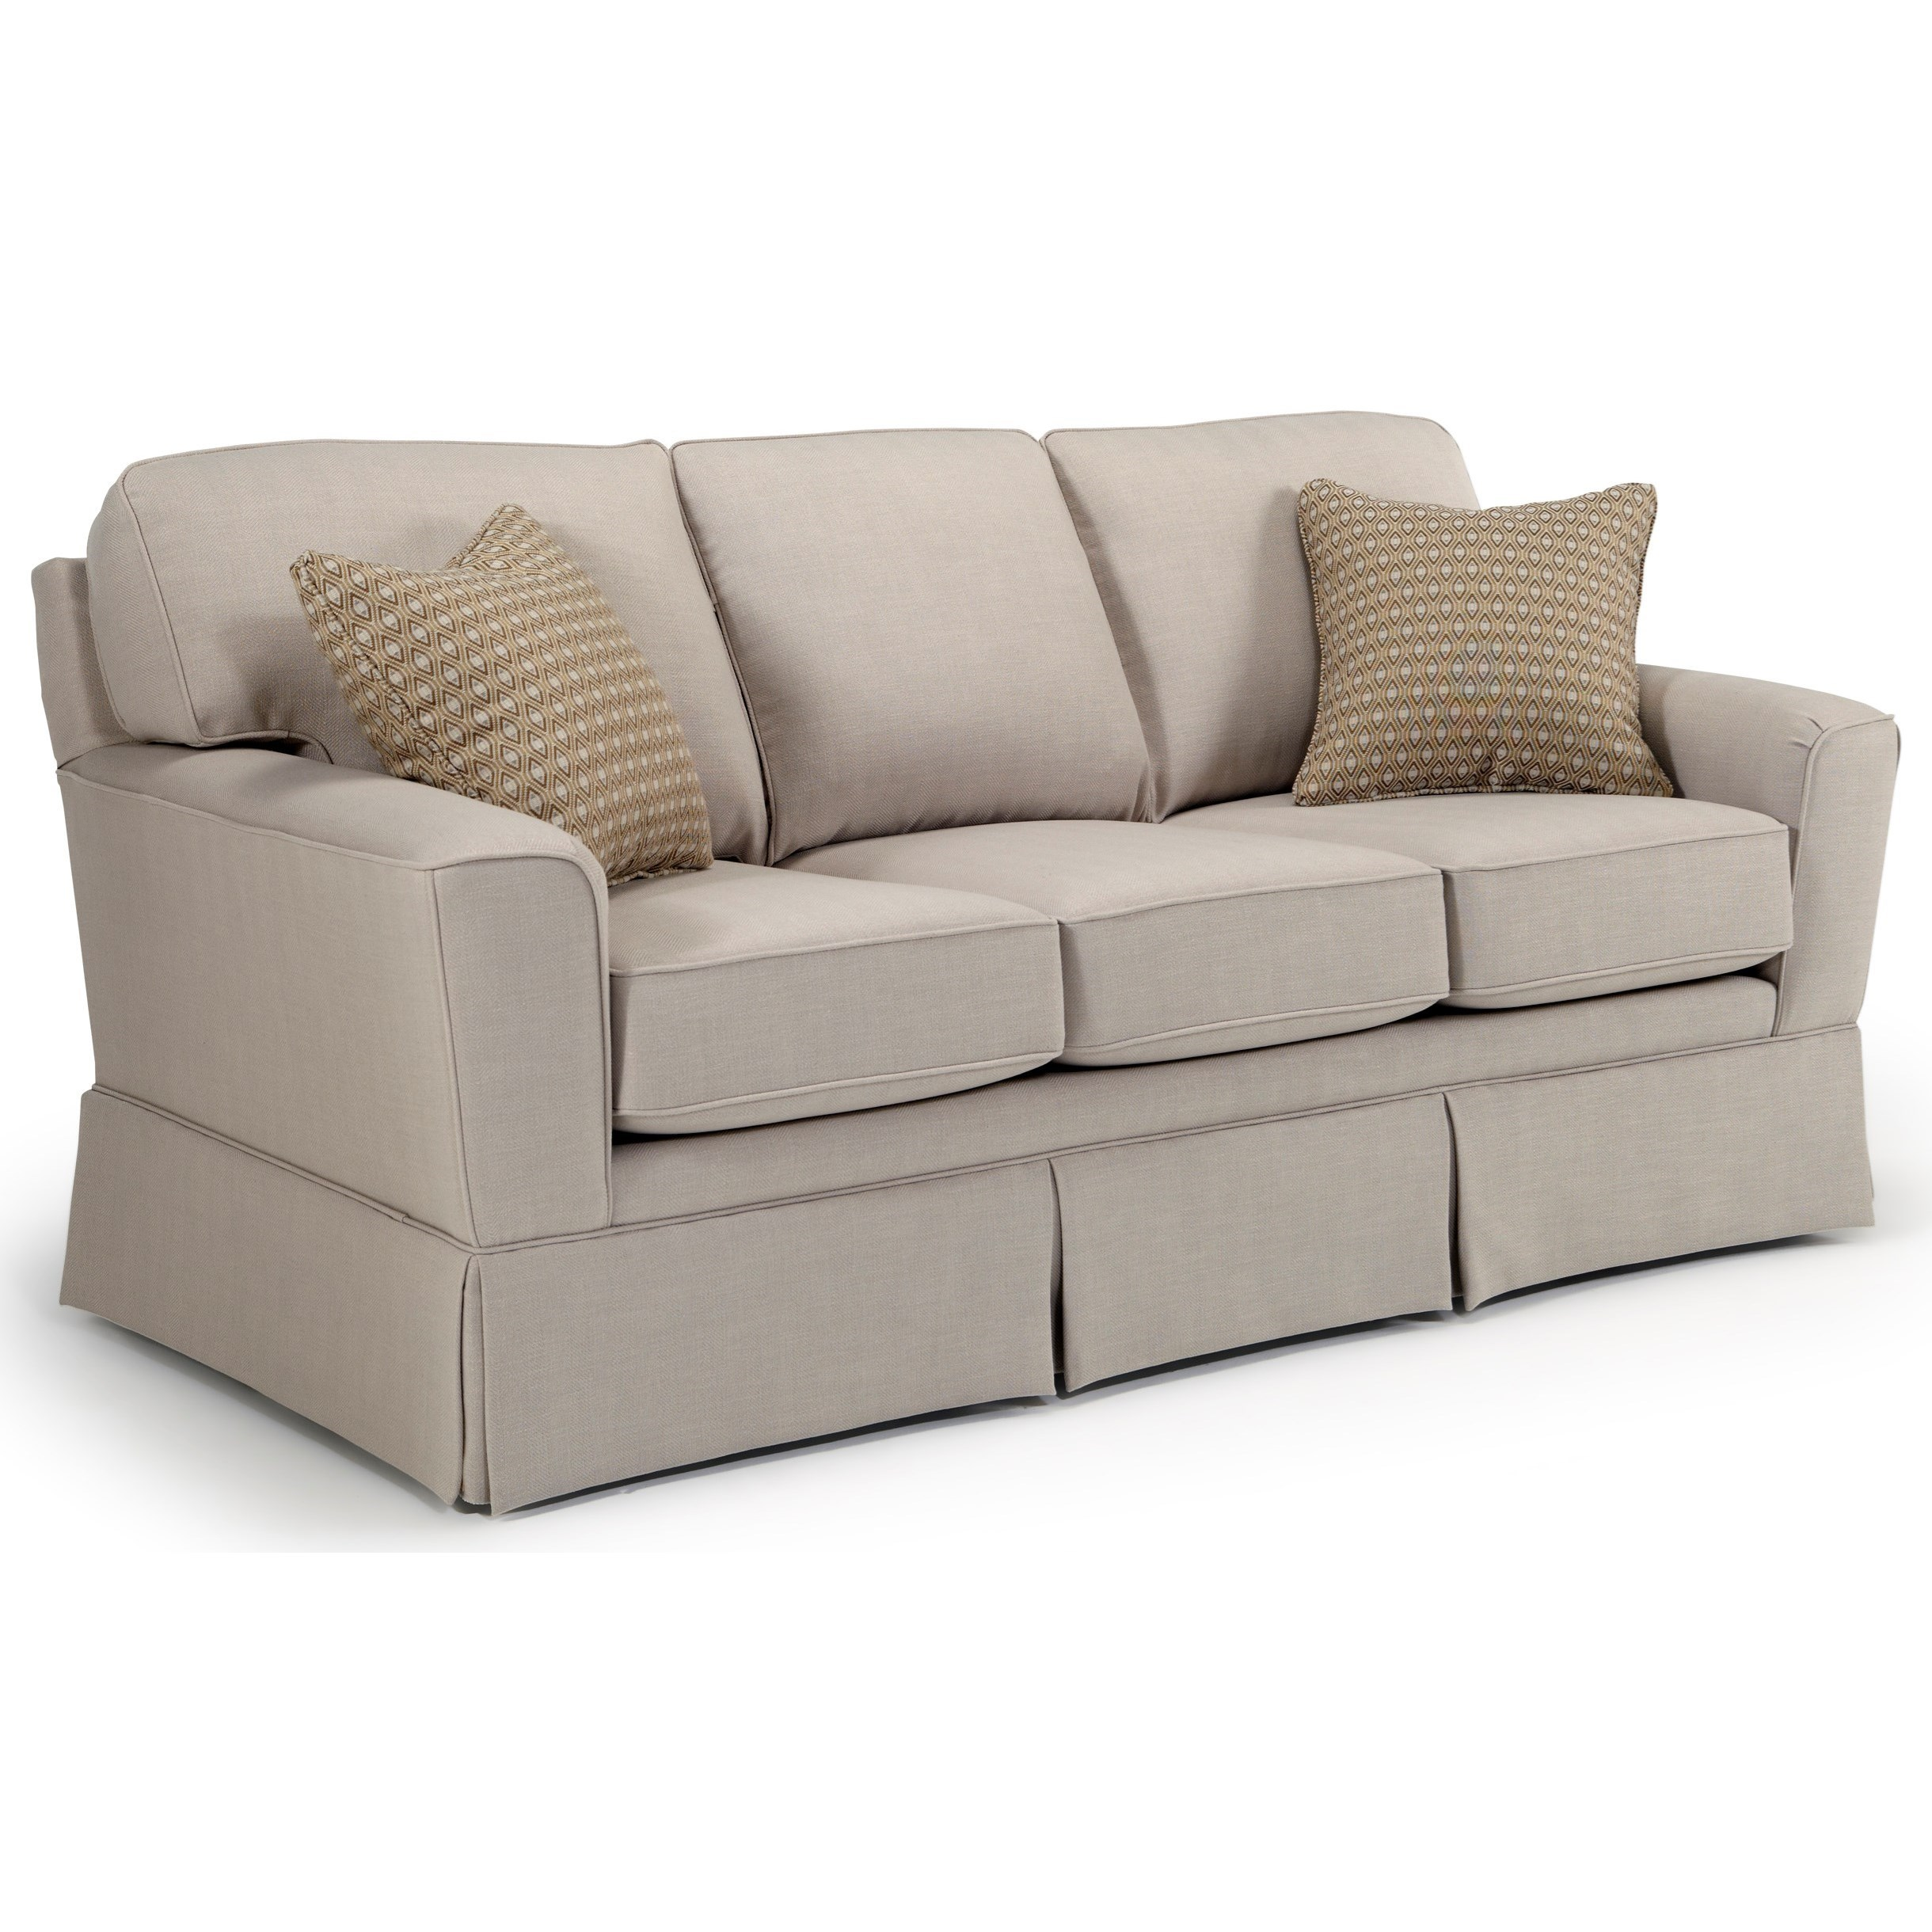 Best Home Furnishings Annabel  <b>Custom</b> 3 Over 3 Sofa - Item Number: -2110035674-20043B